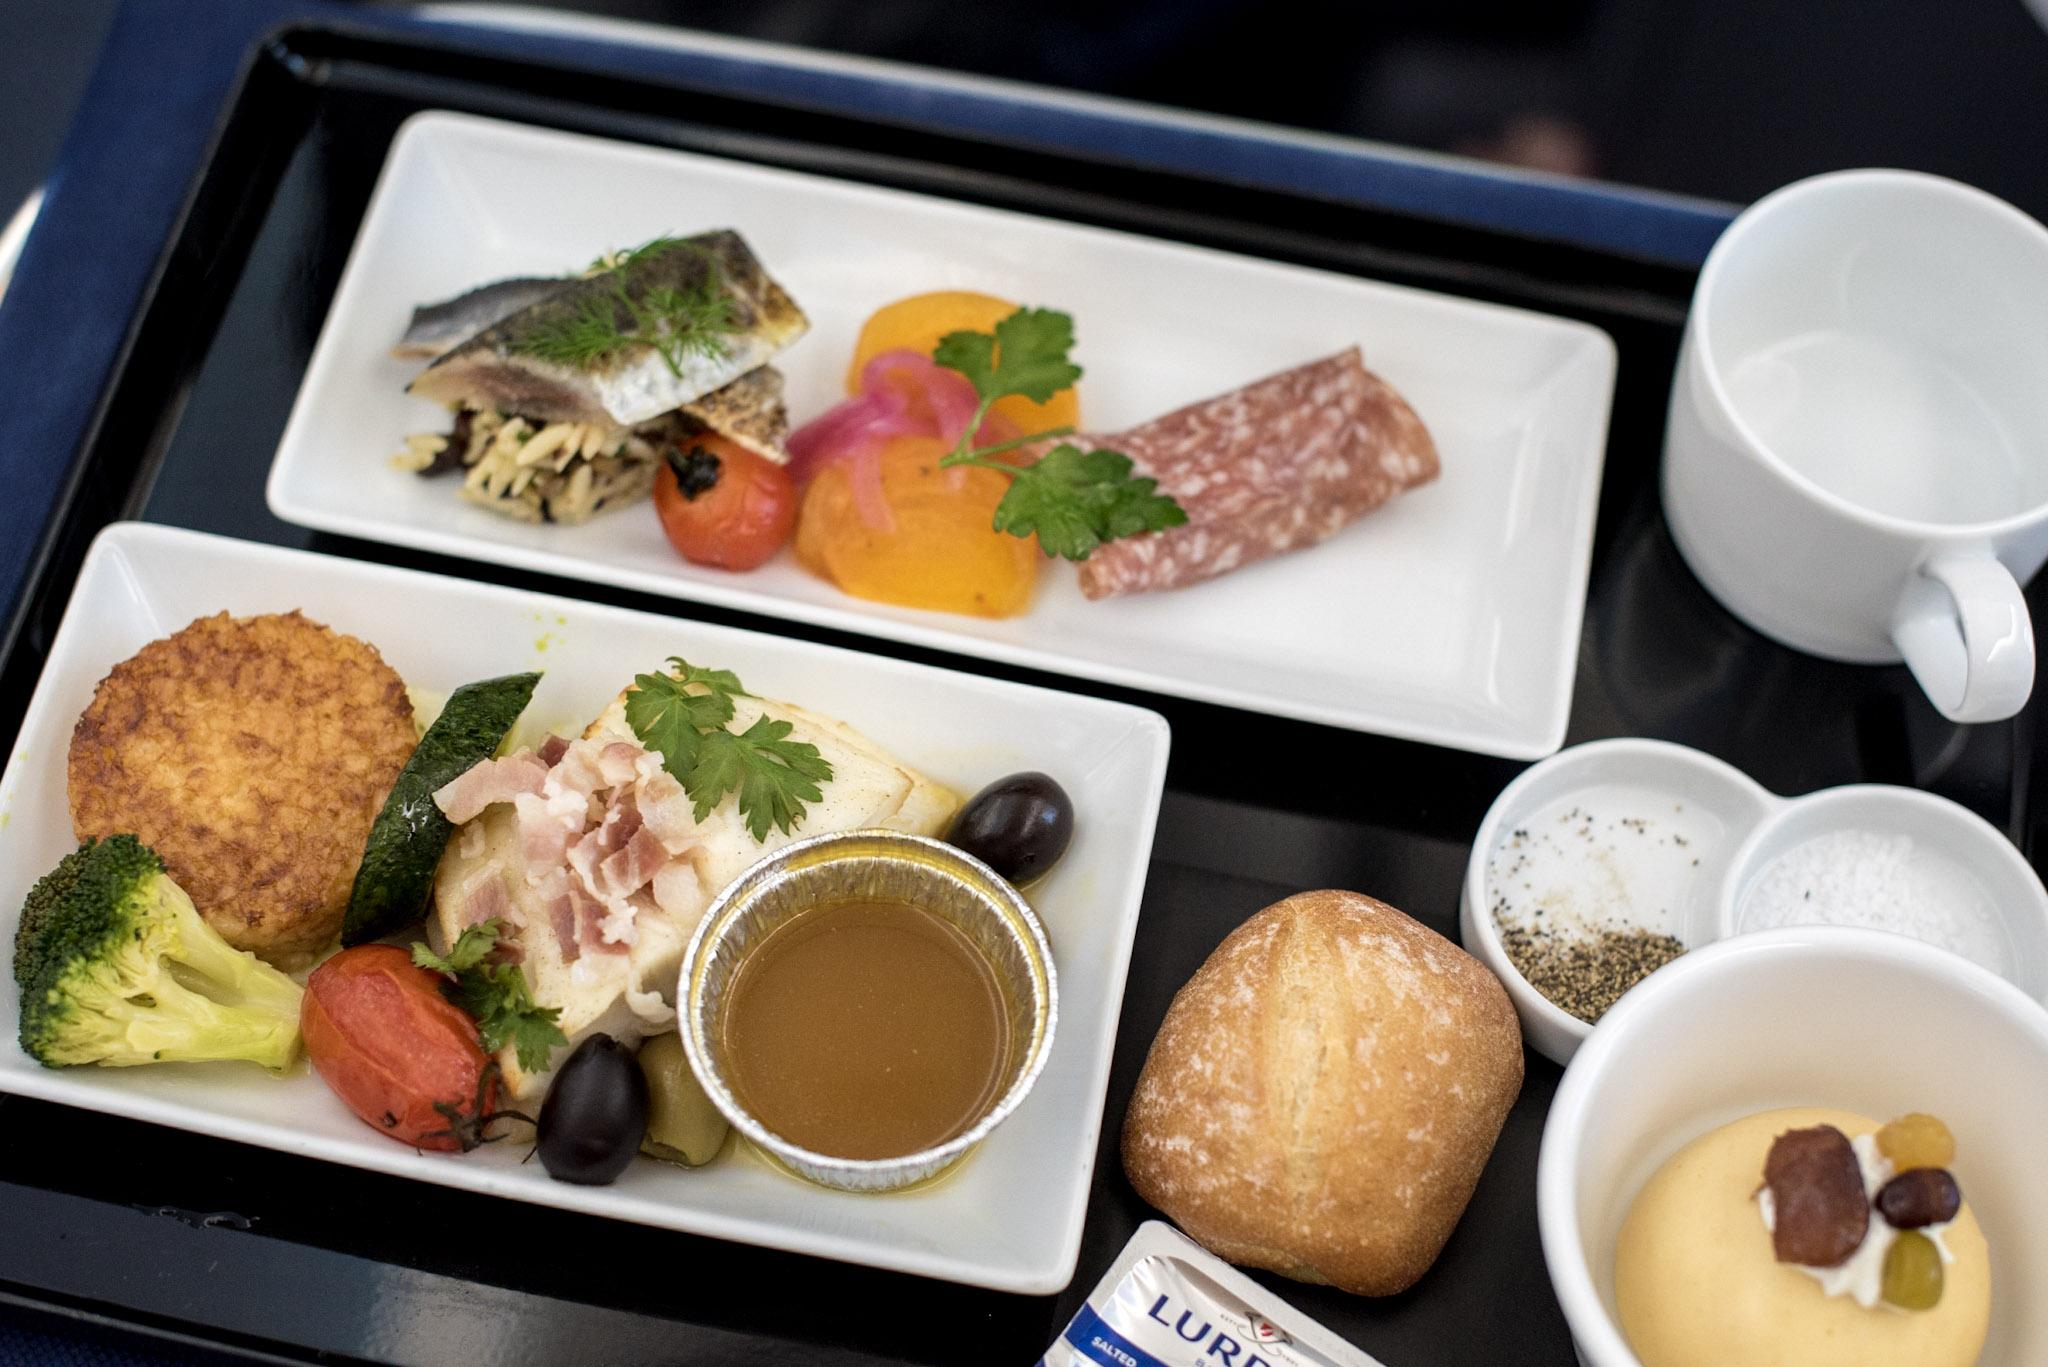 International Cuisine  ANA Business Class 787-900 - NH859 (HND-HKG)